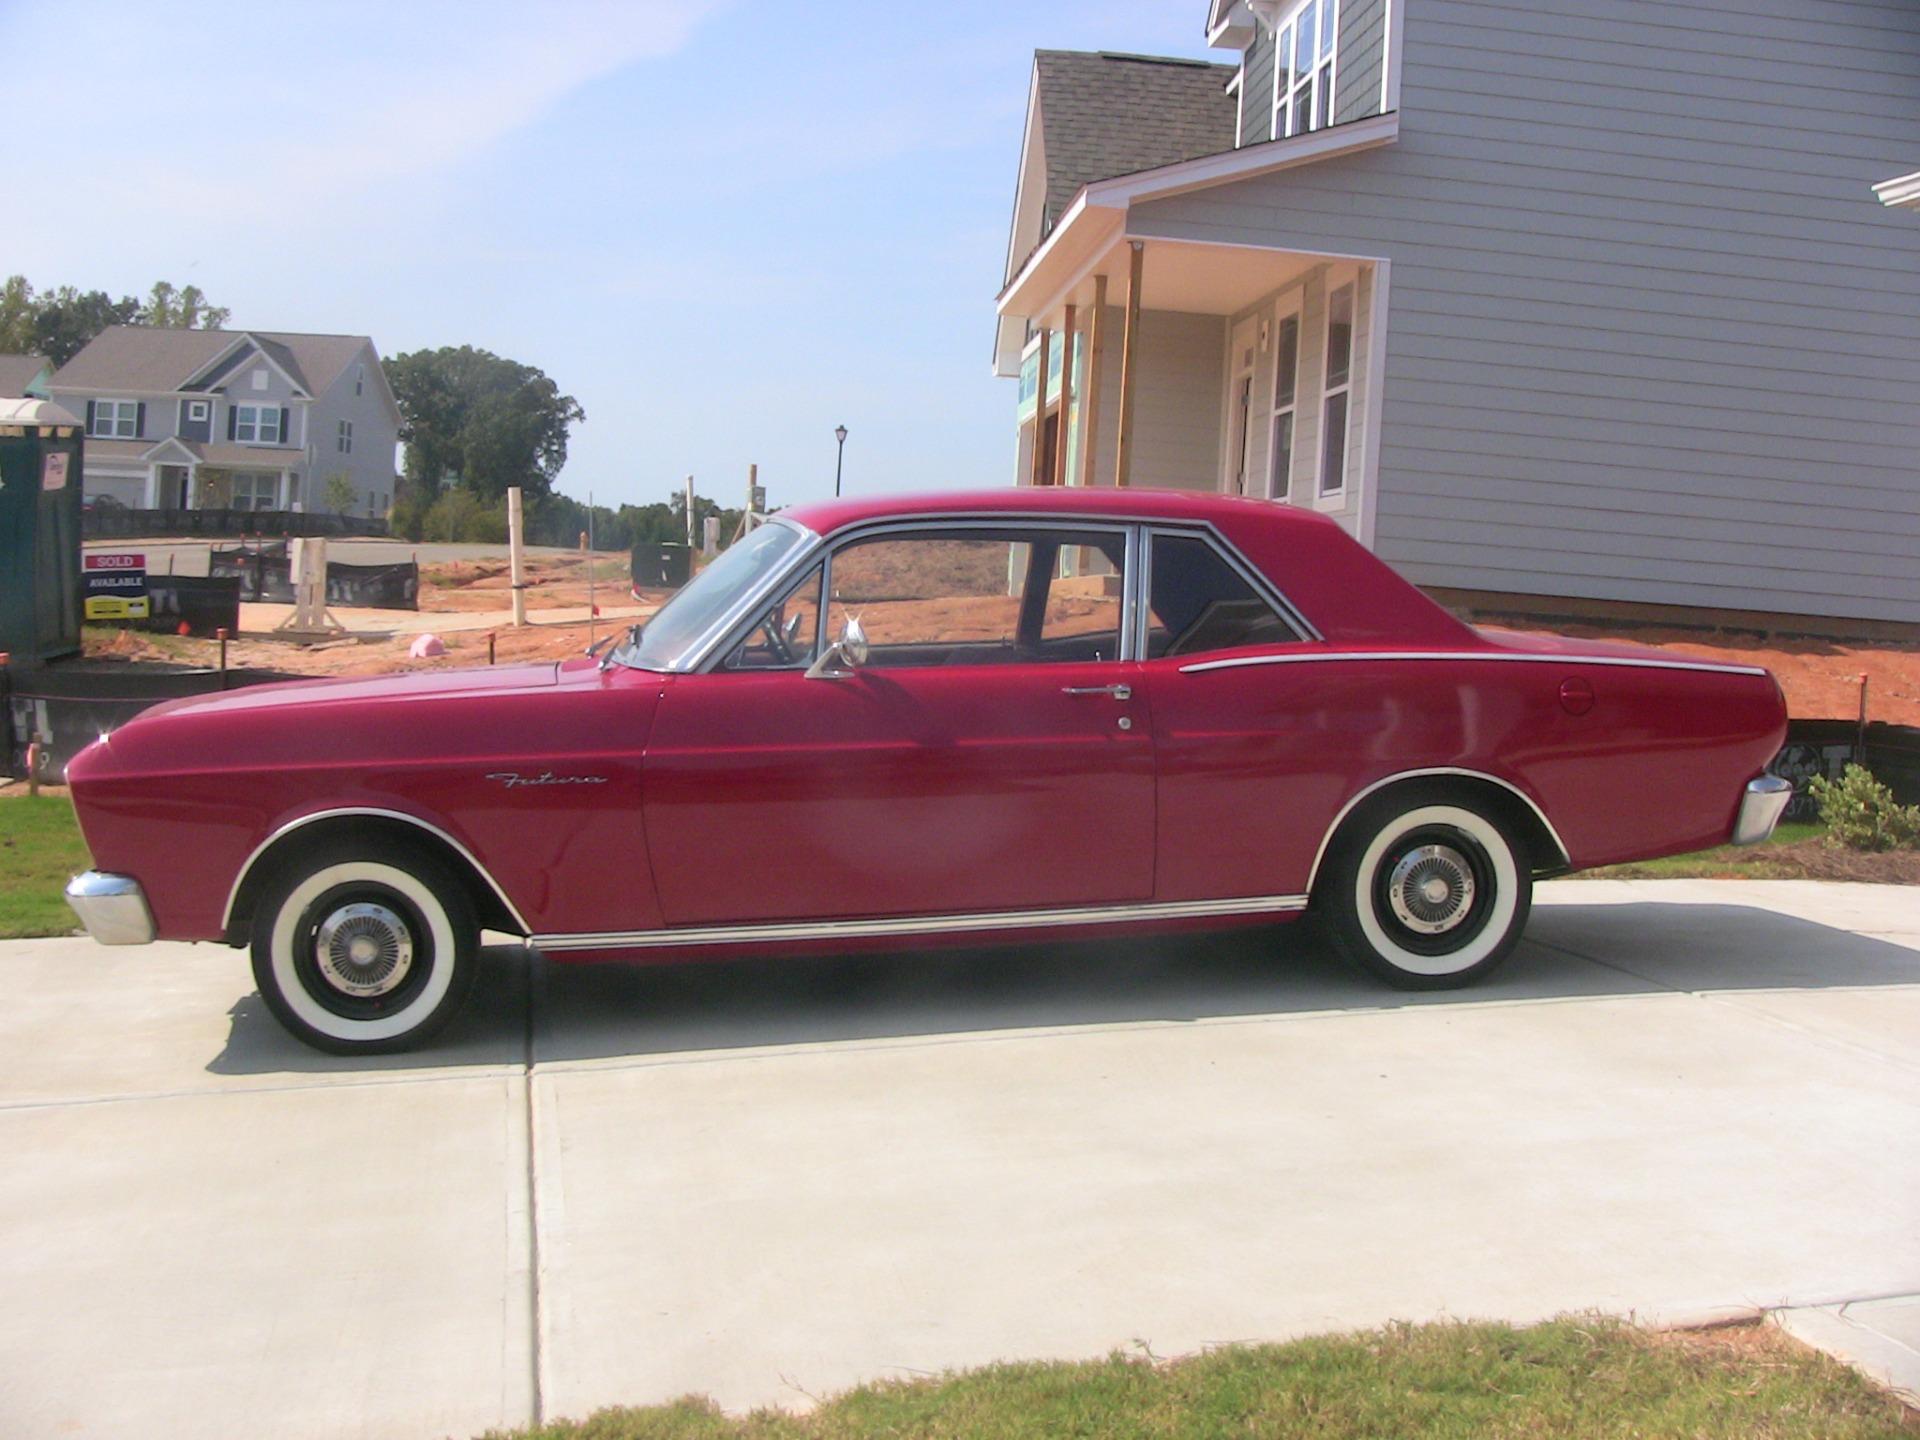 Used 1966 Ford Falcon Futura